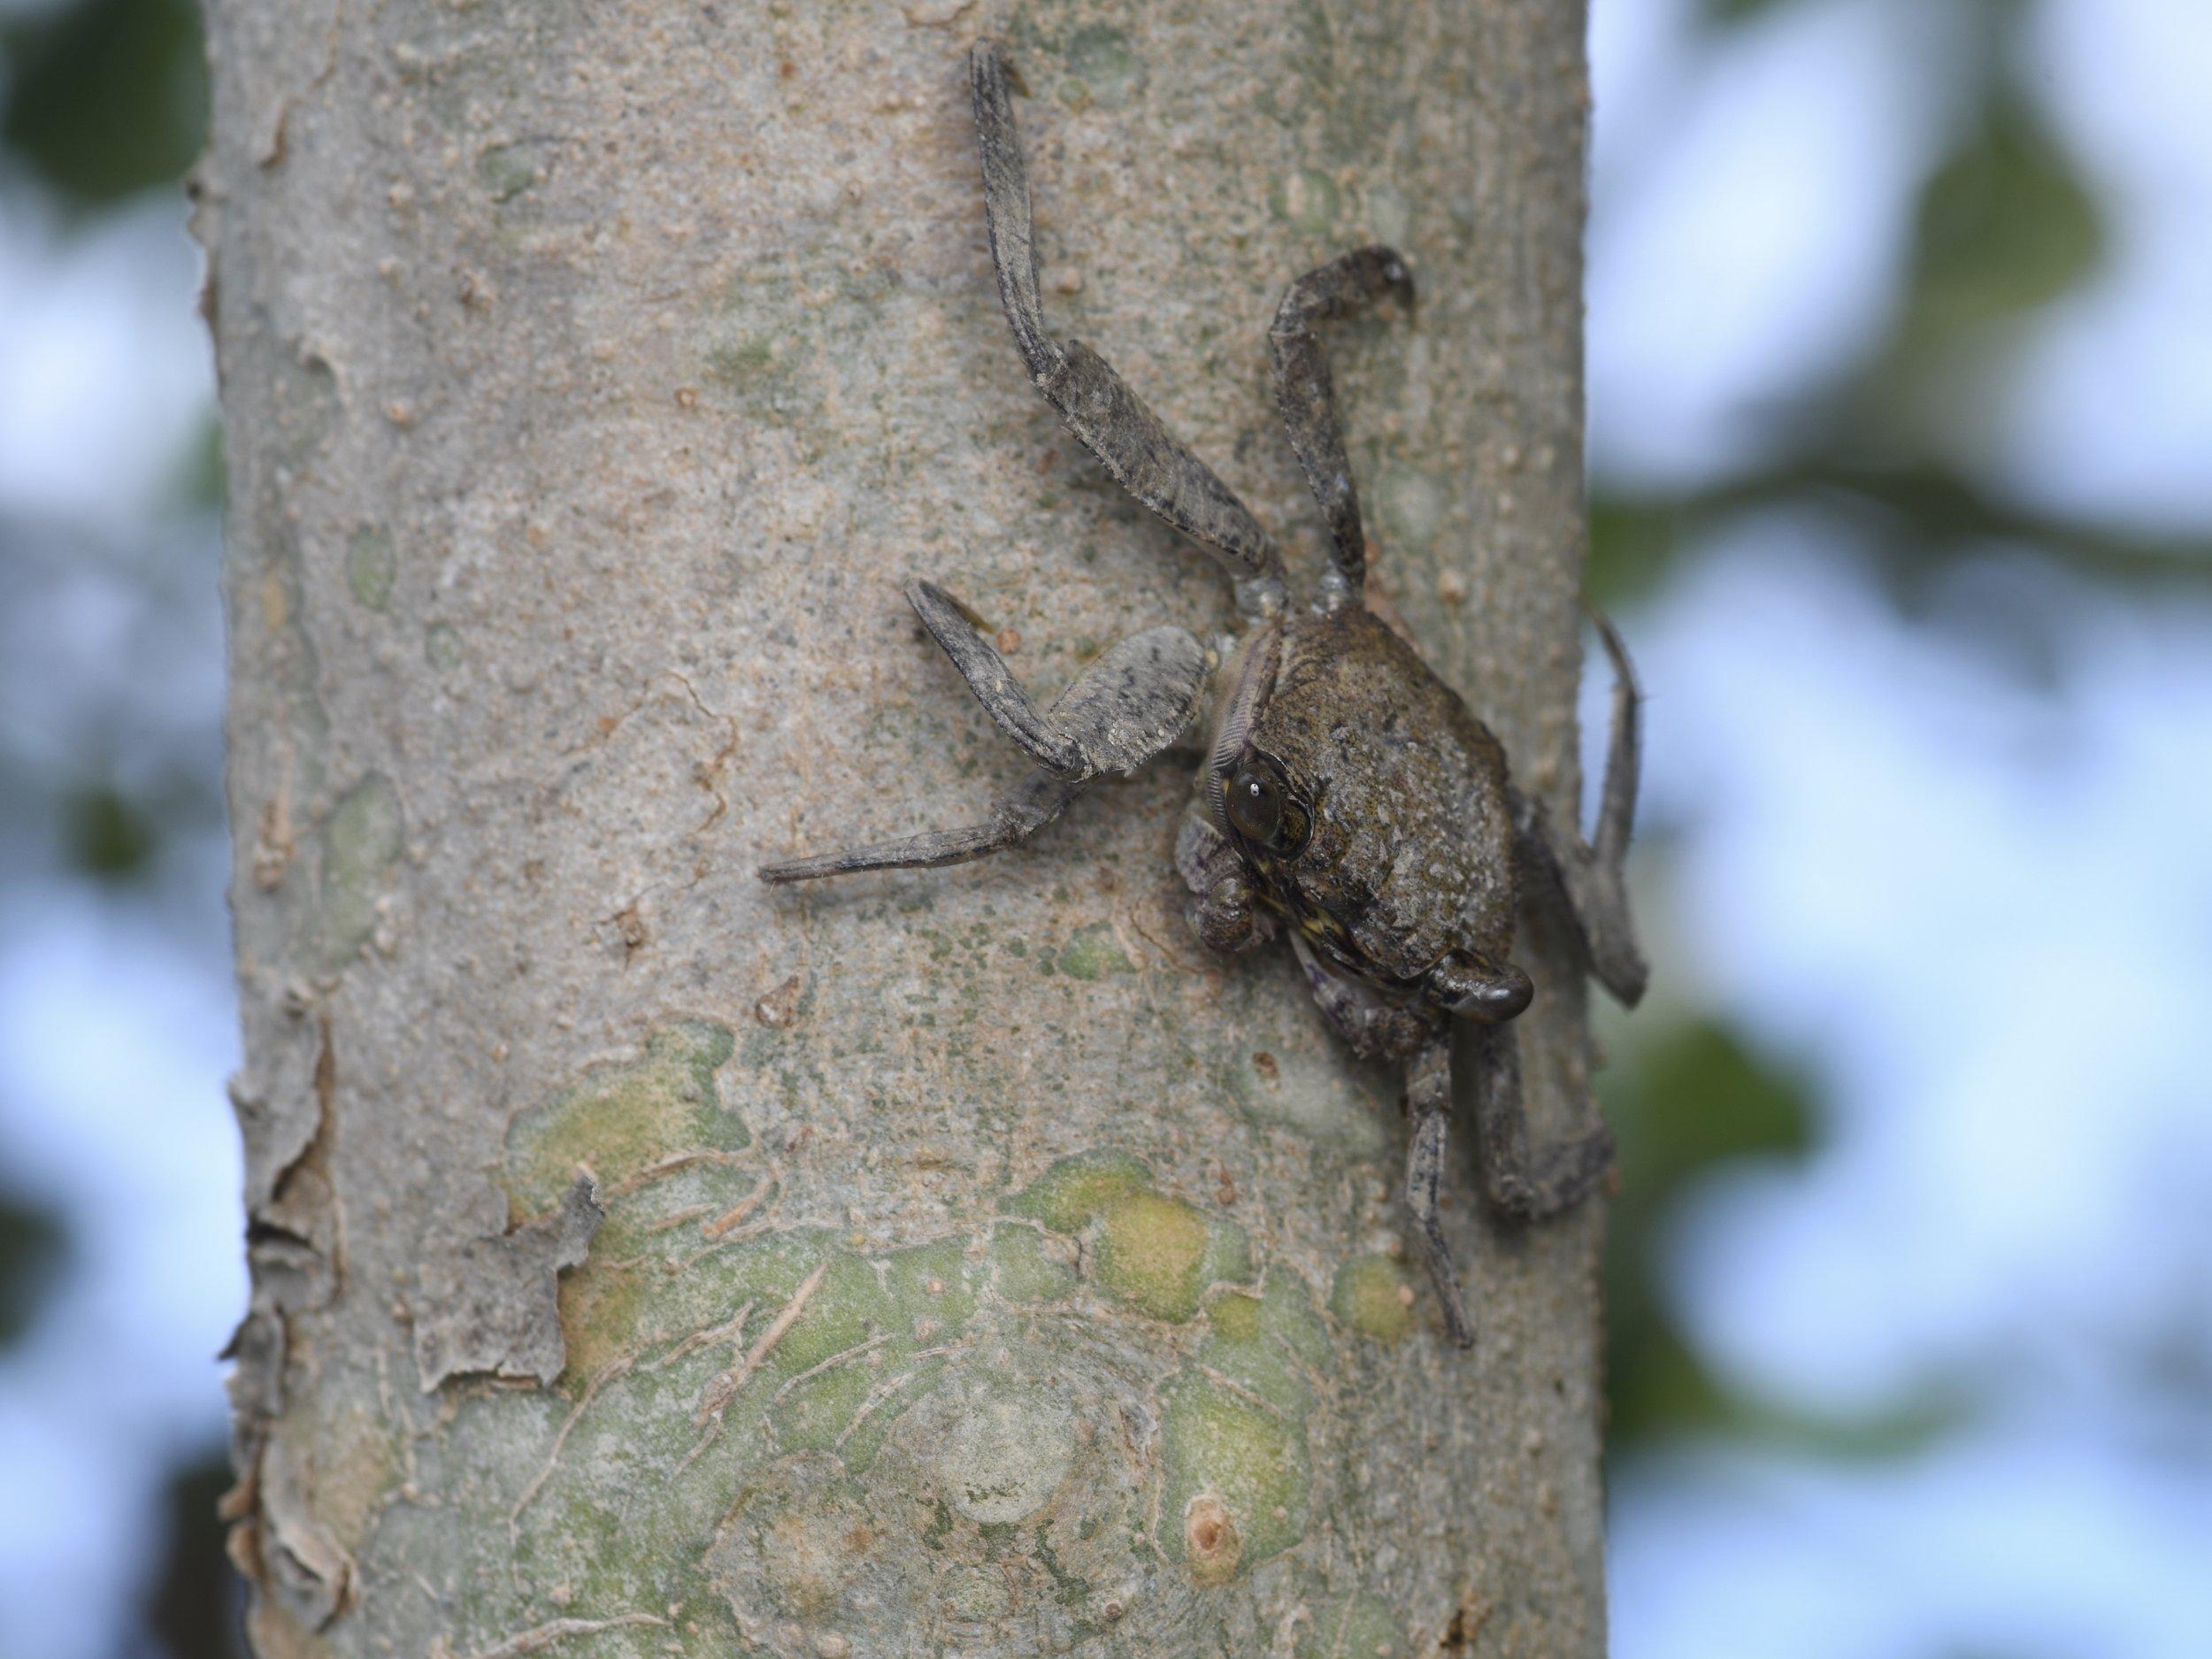 Tree Crab (Sesarmidae sp.),   Berjaya mangrove, Burau Bay, Langkawi Island, Malaysia  • Nikon D500, Tokina 100mm f/2,8 macro, Nikon SB900 @ 1/8 power with Alex Goh Macro Diffuser, ISO100, f/16, 1/60s